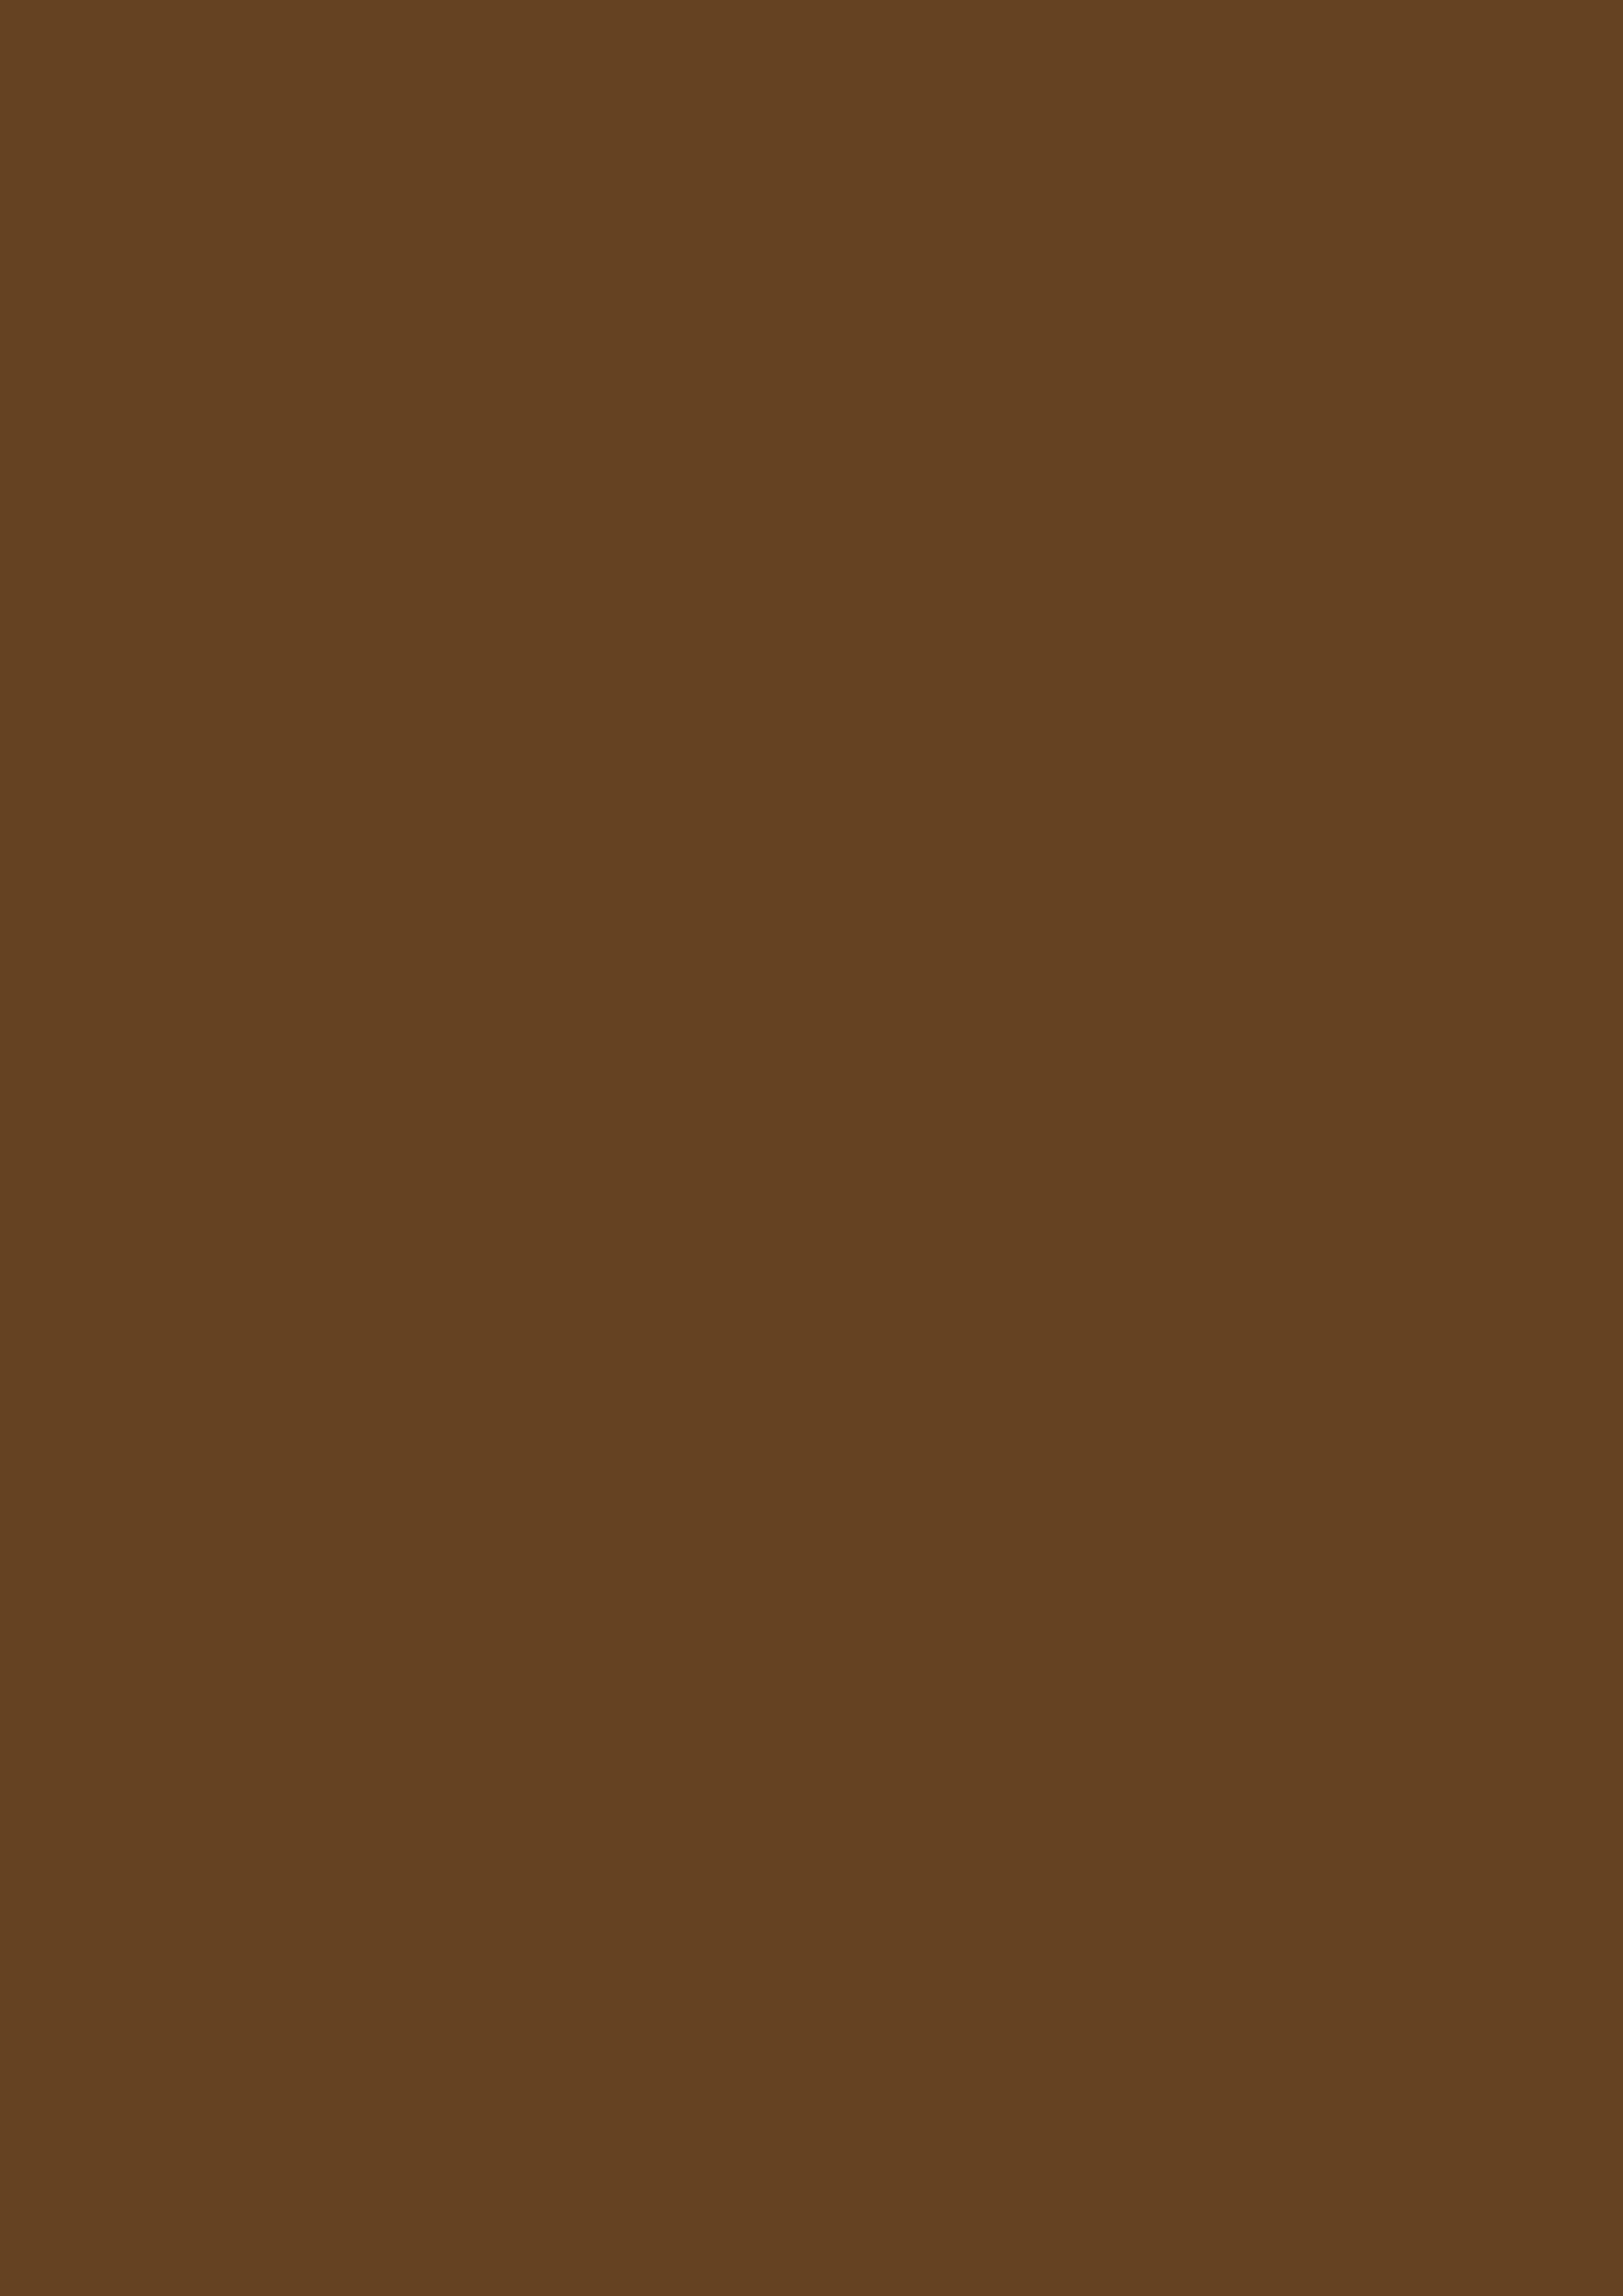 2480x3508 Dark Brown Solid Color Background